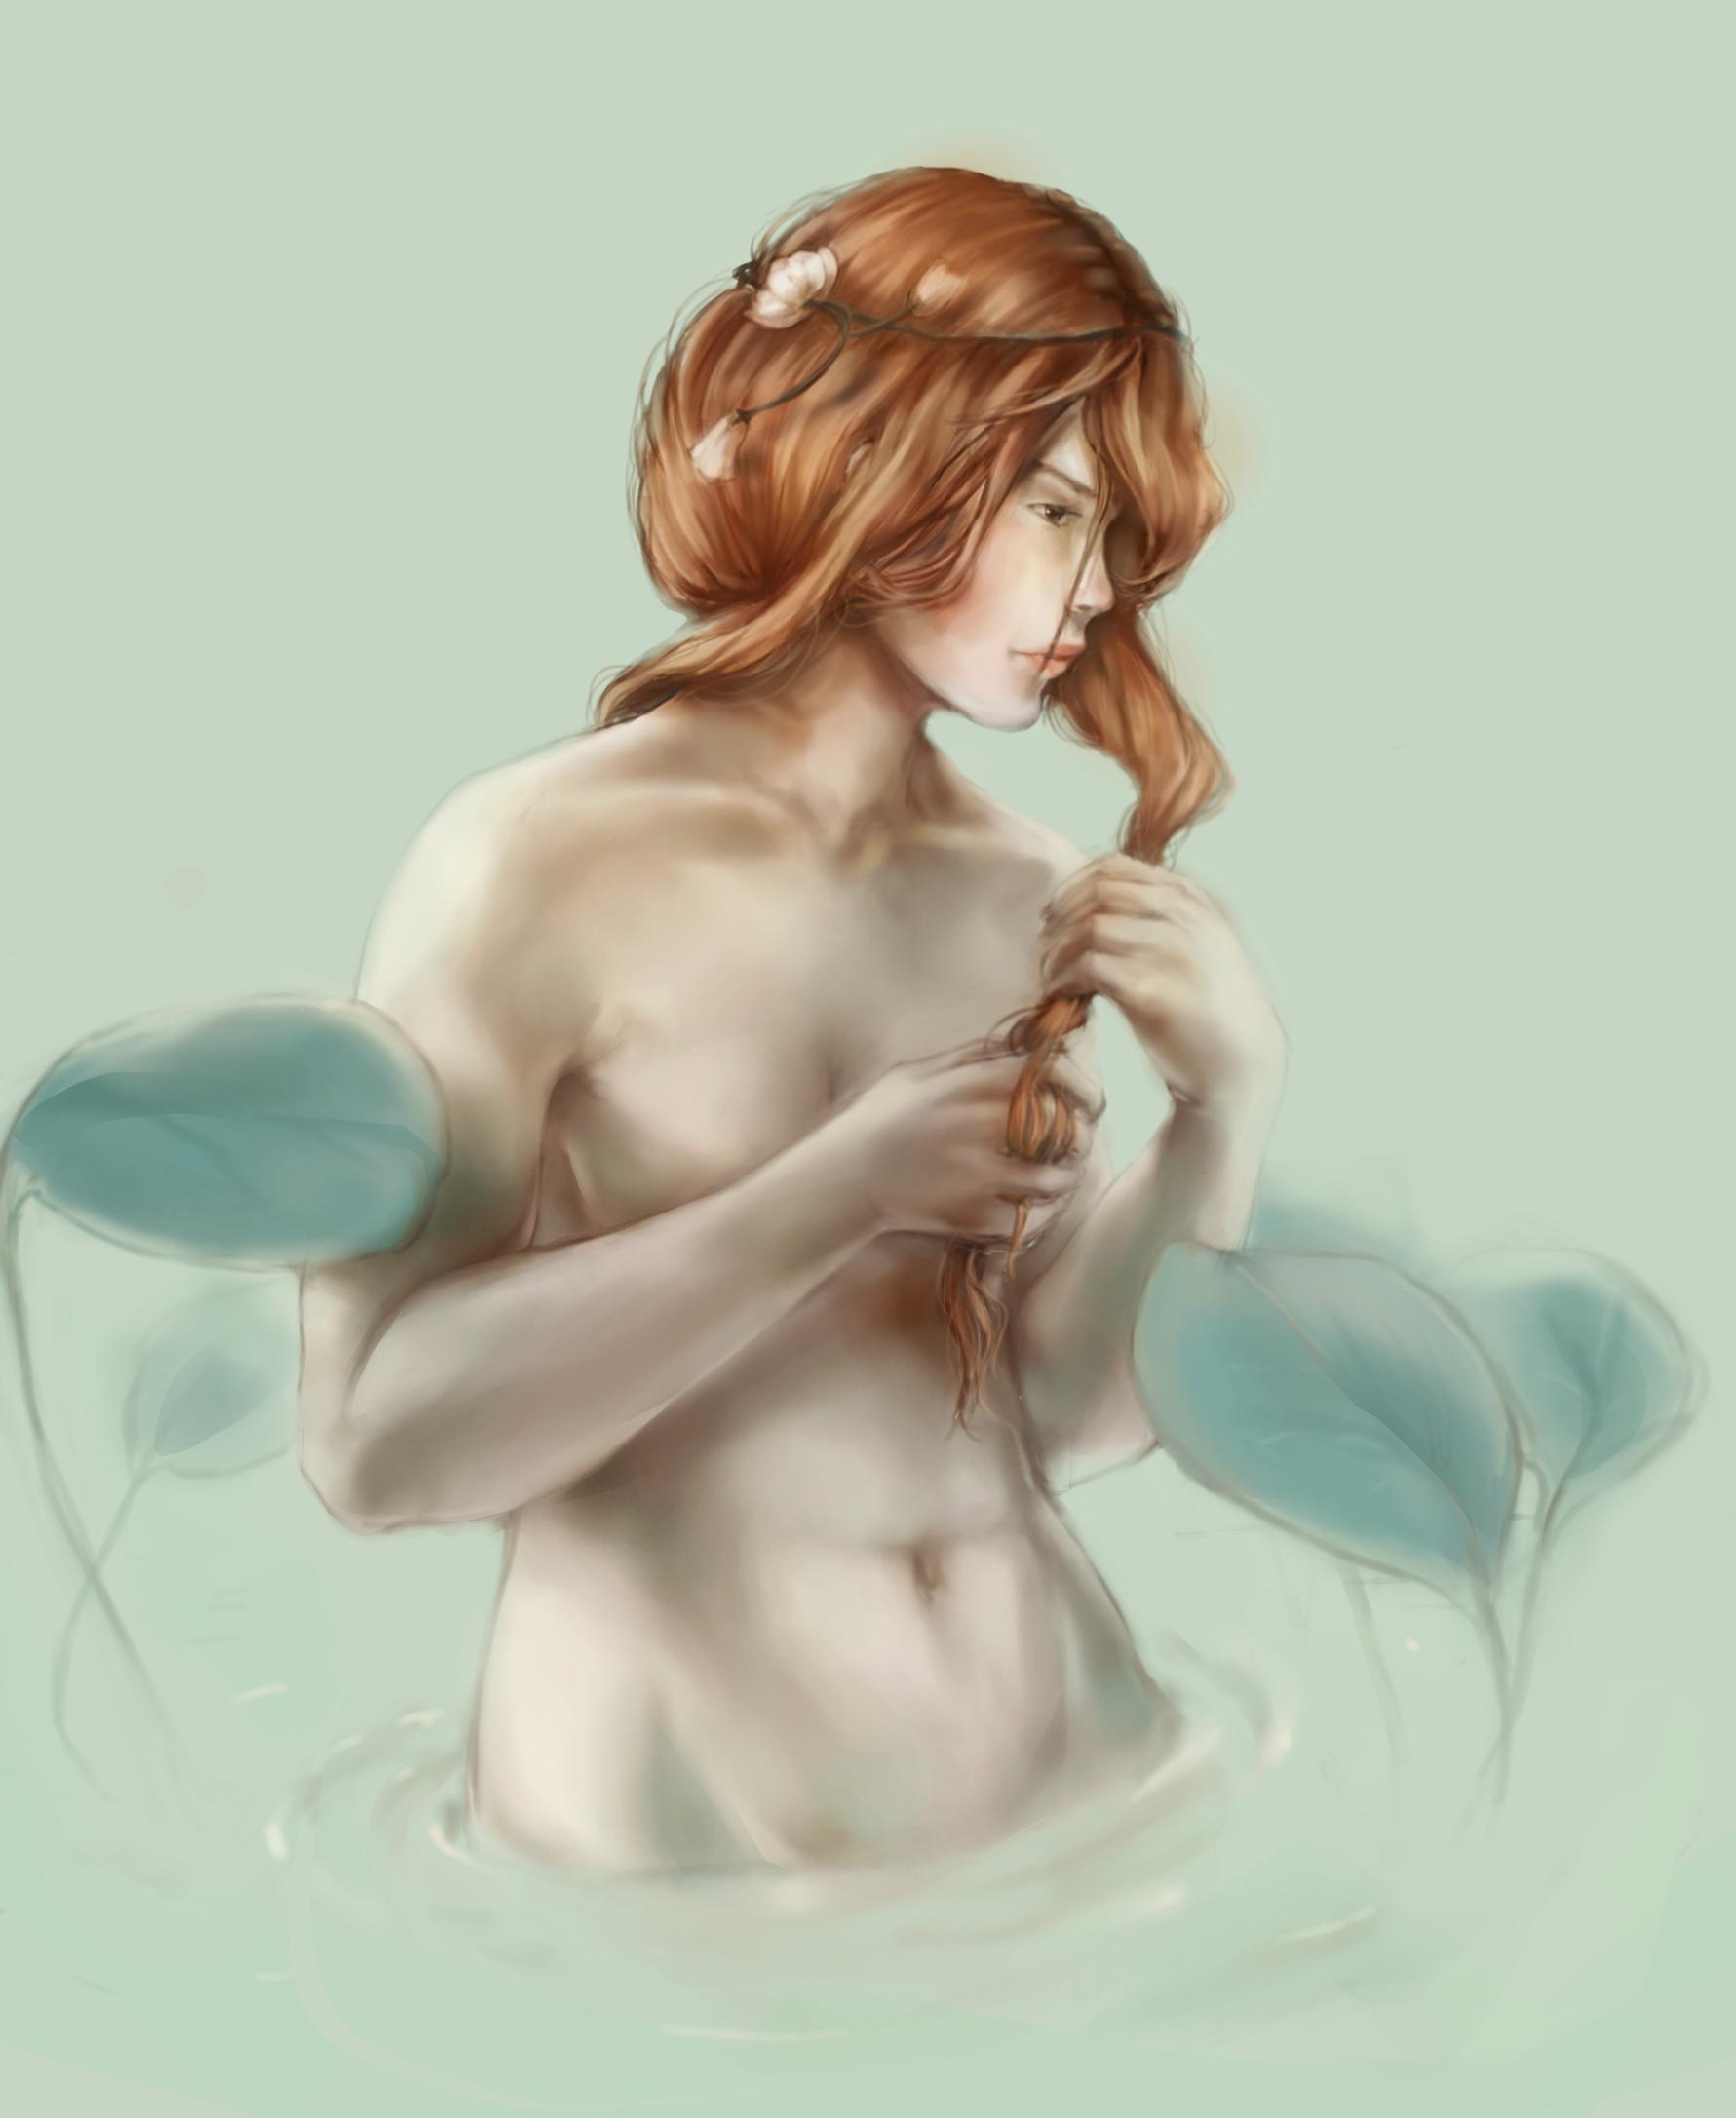 Nymph by Stigerea